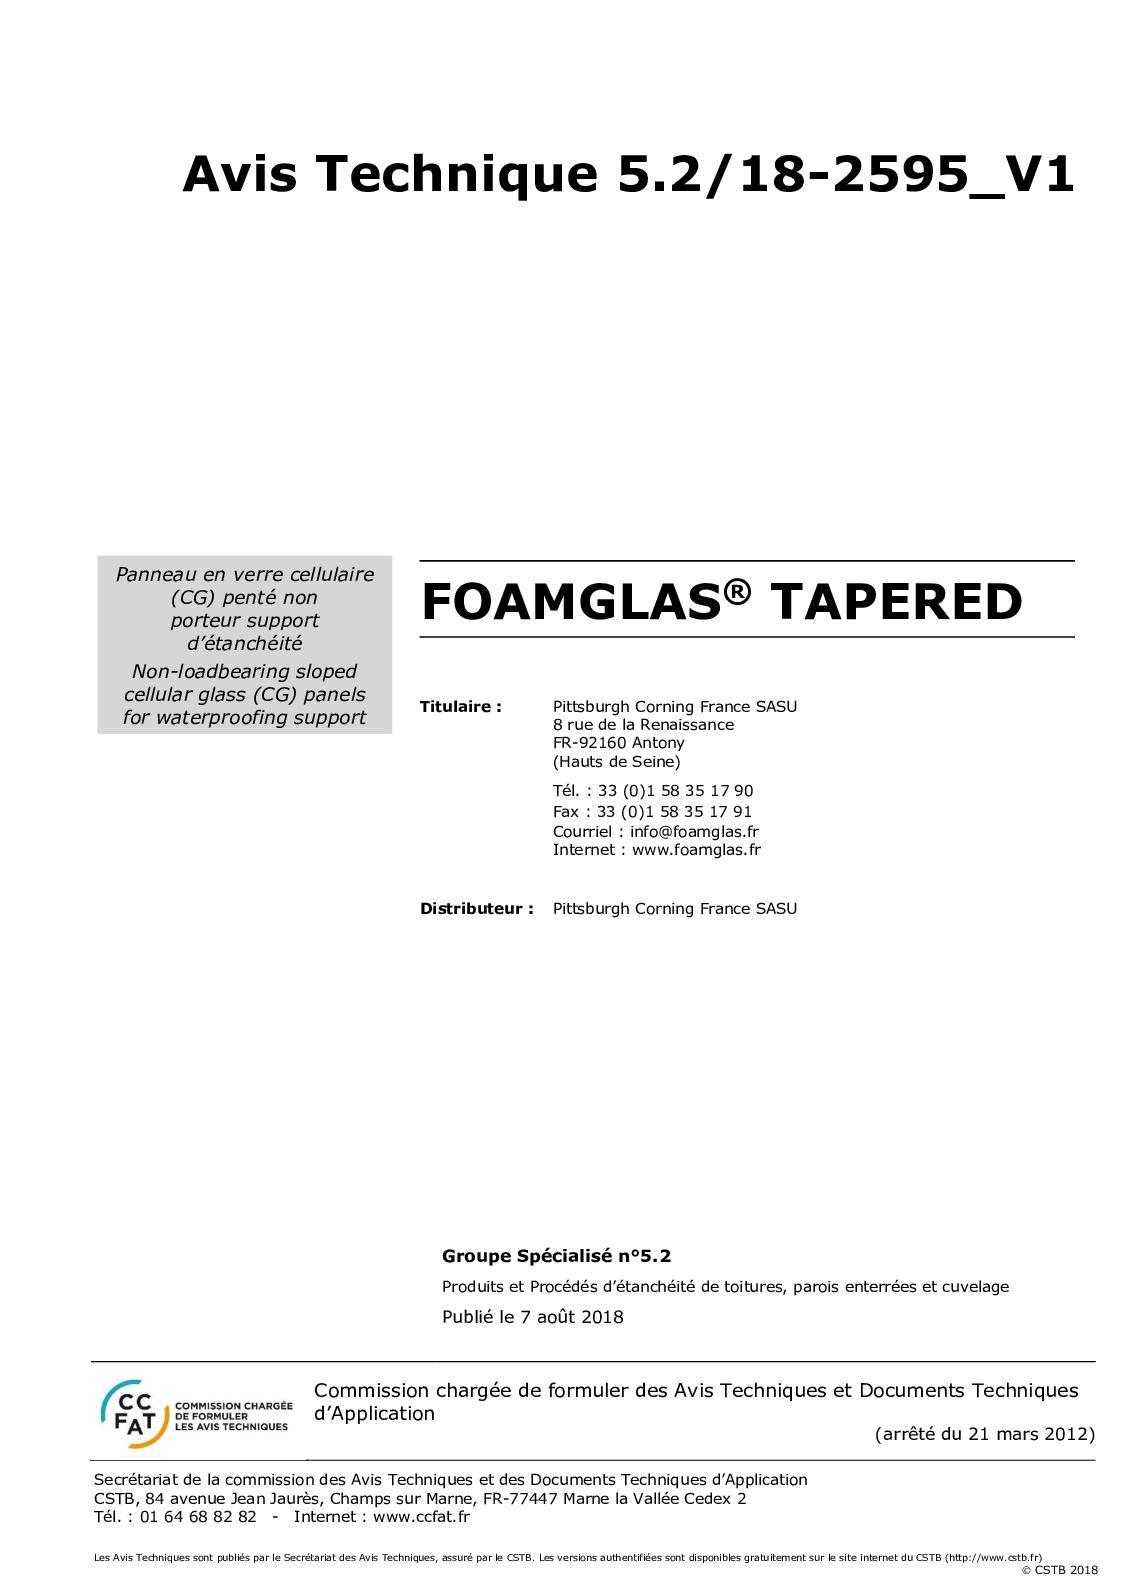 Calaméo Avis Technique Foamglas Tapered